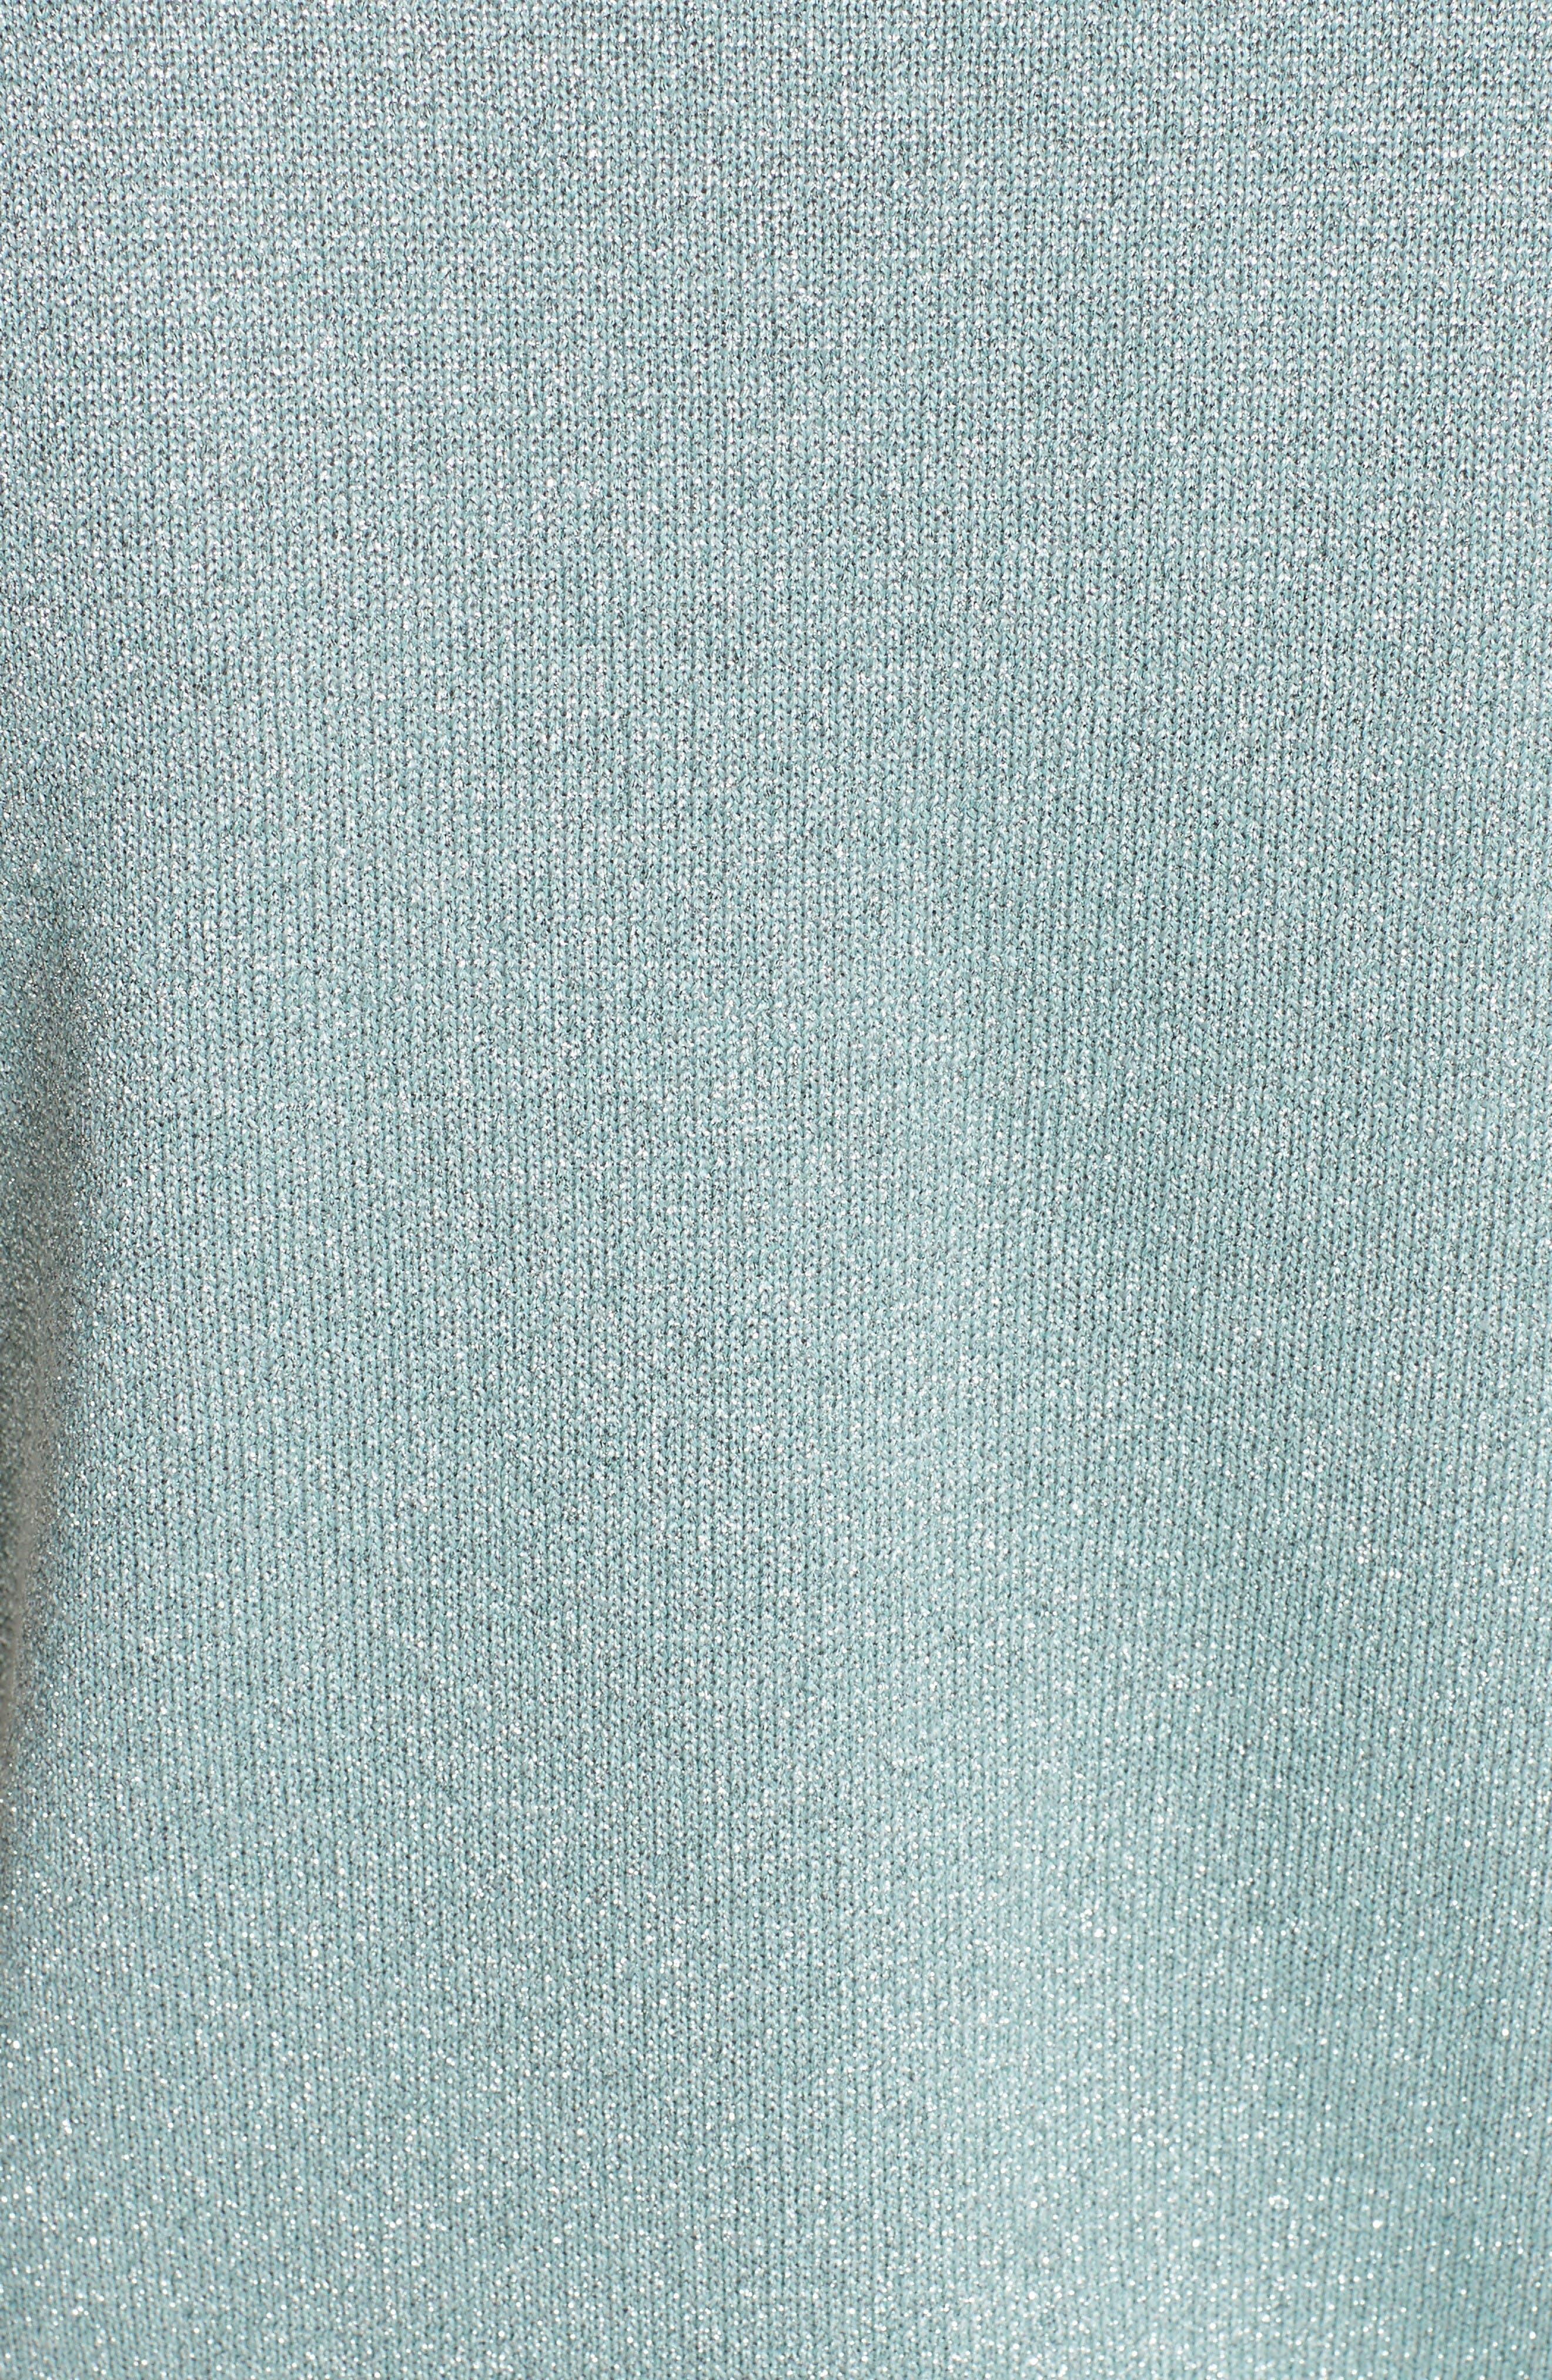 Alternate Image 3  - Shrimps Mary Merino Wool Blend Sweater